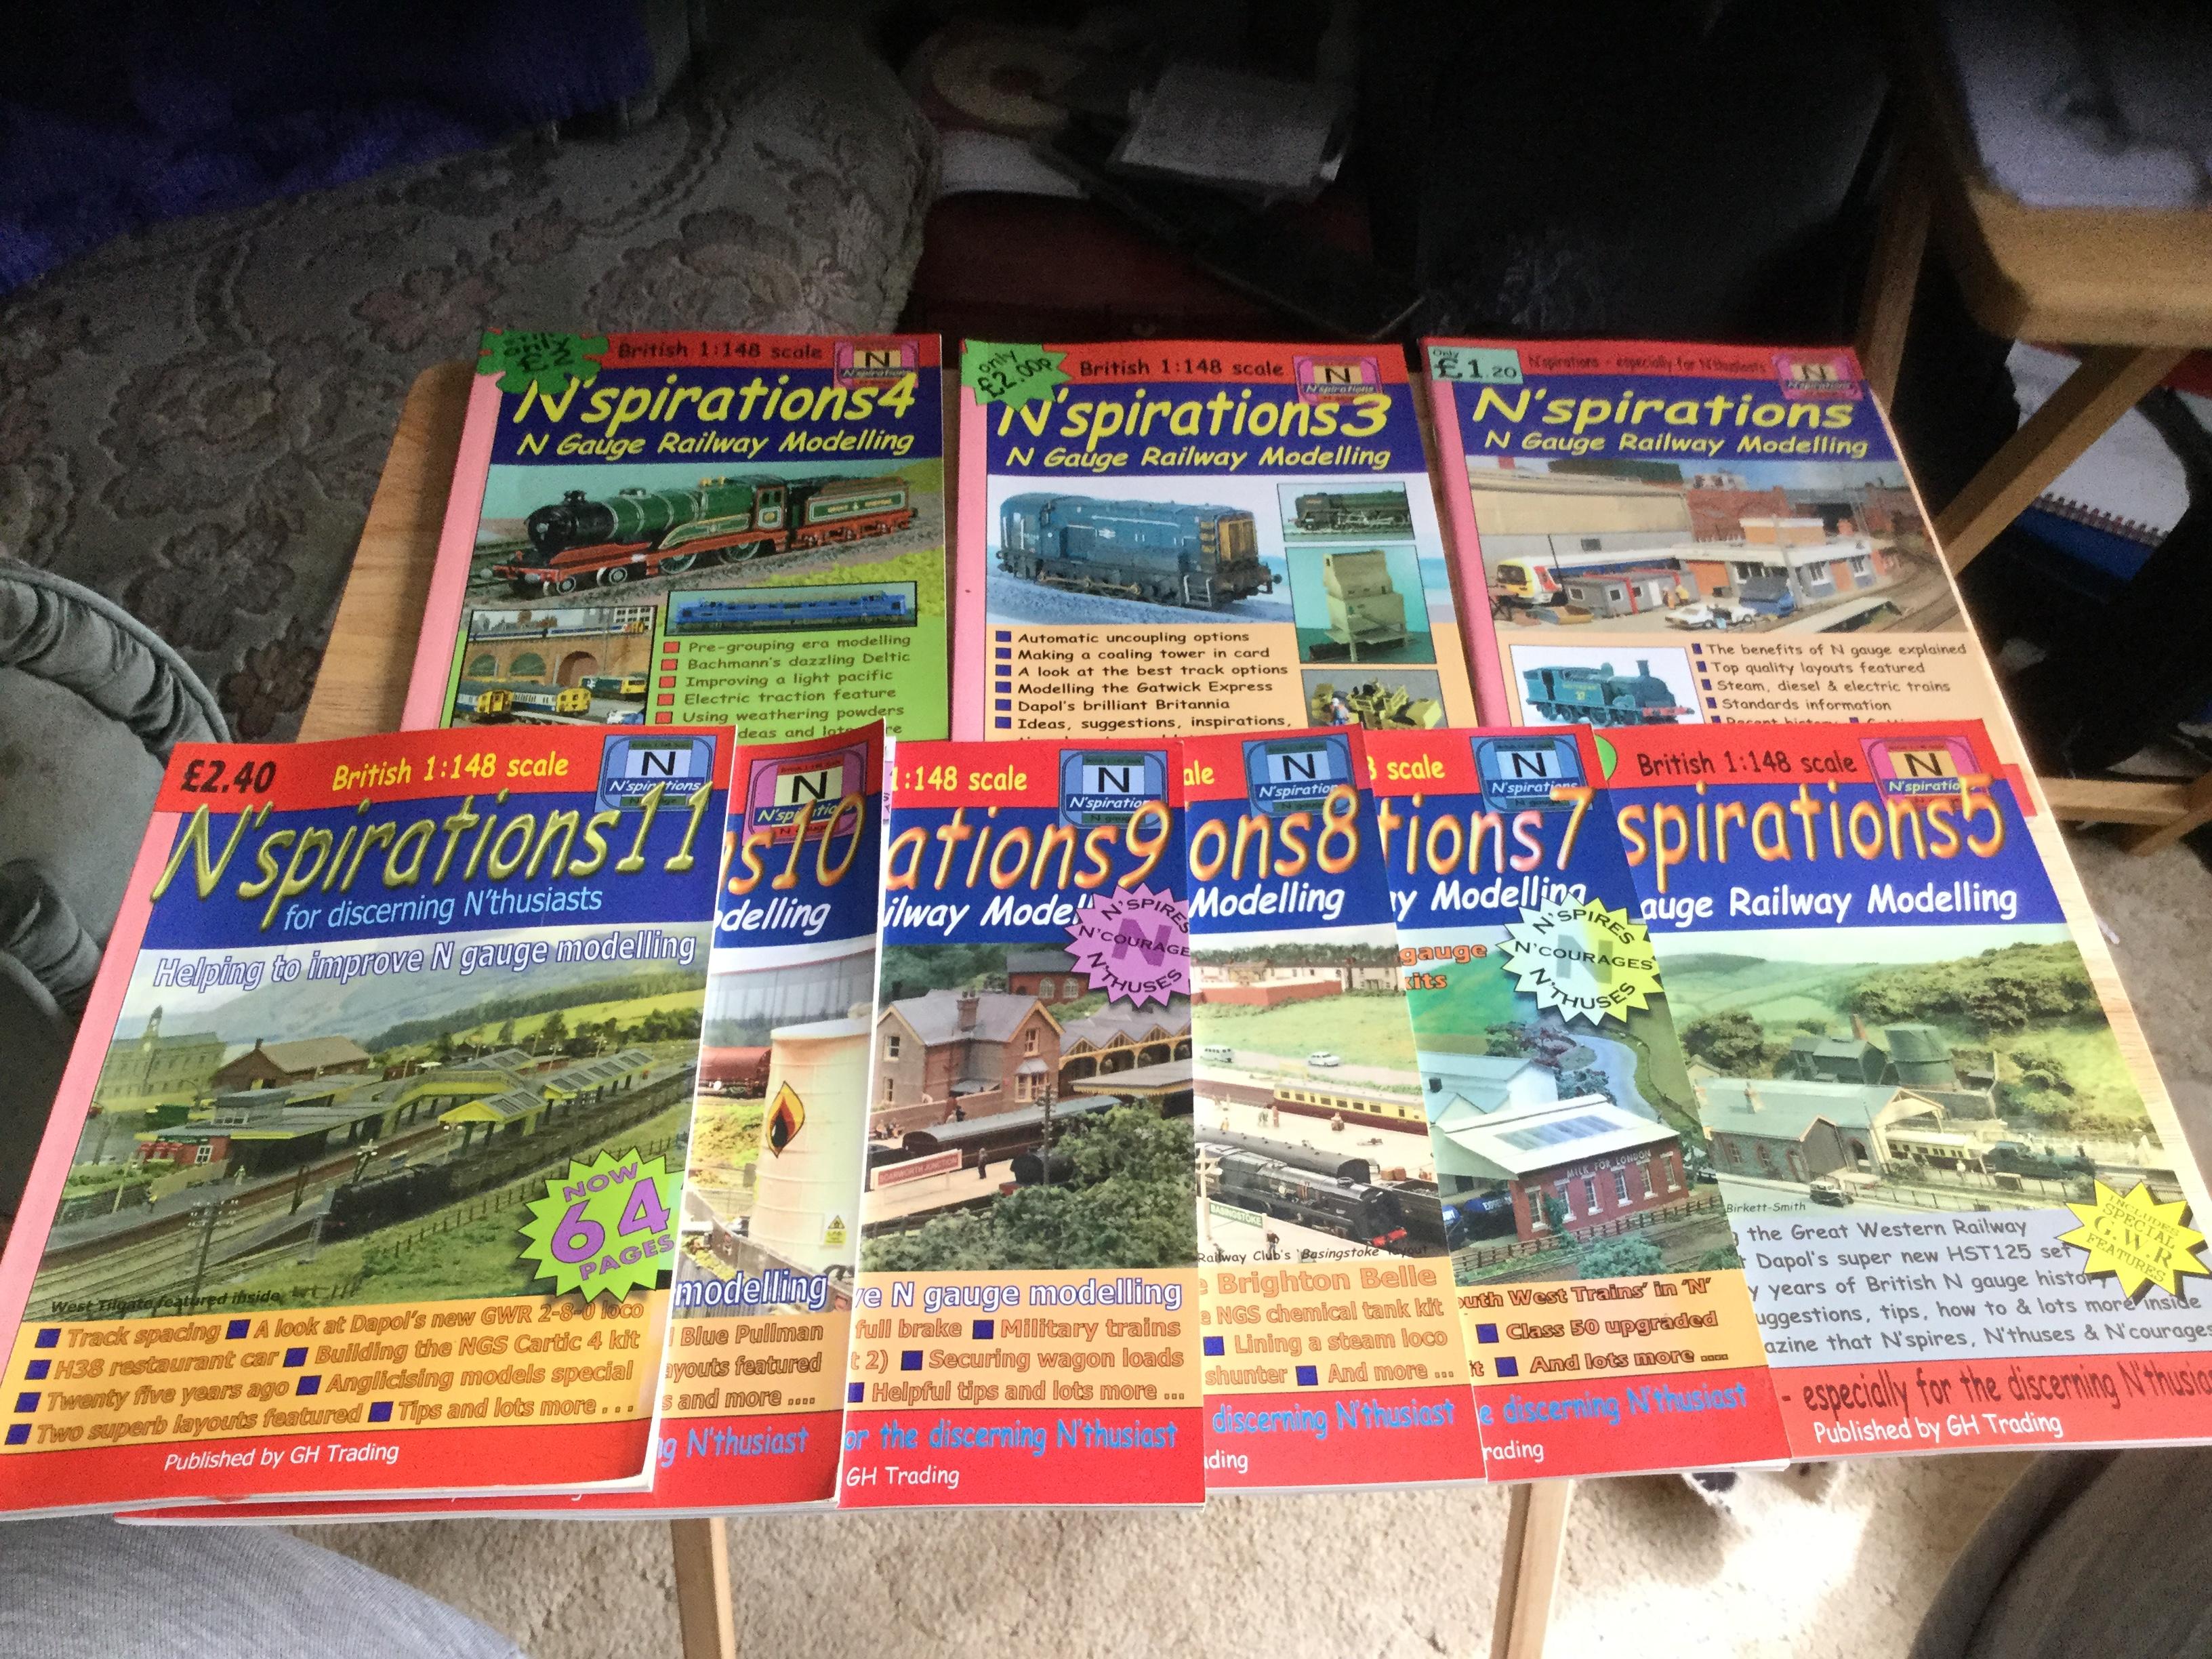 N'spirations Magazine set